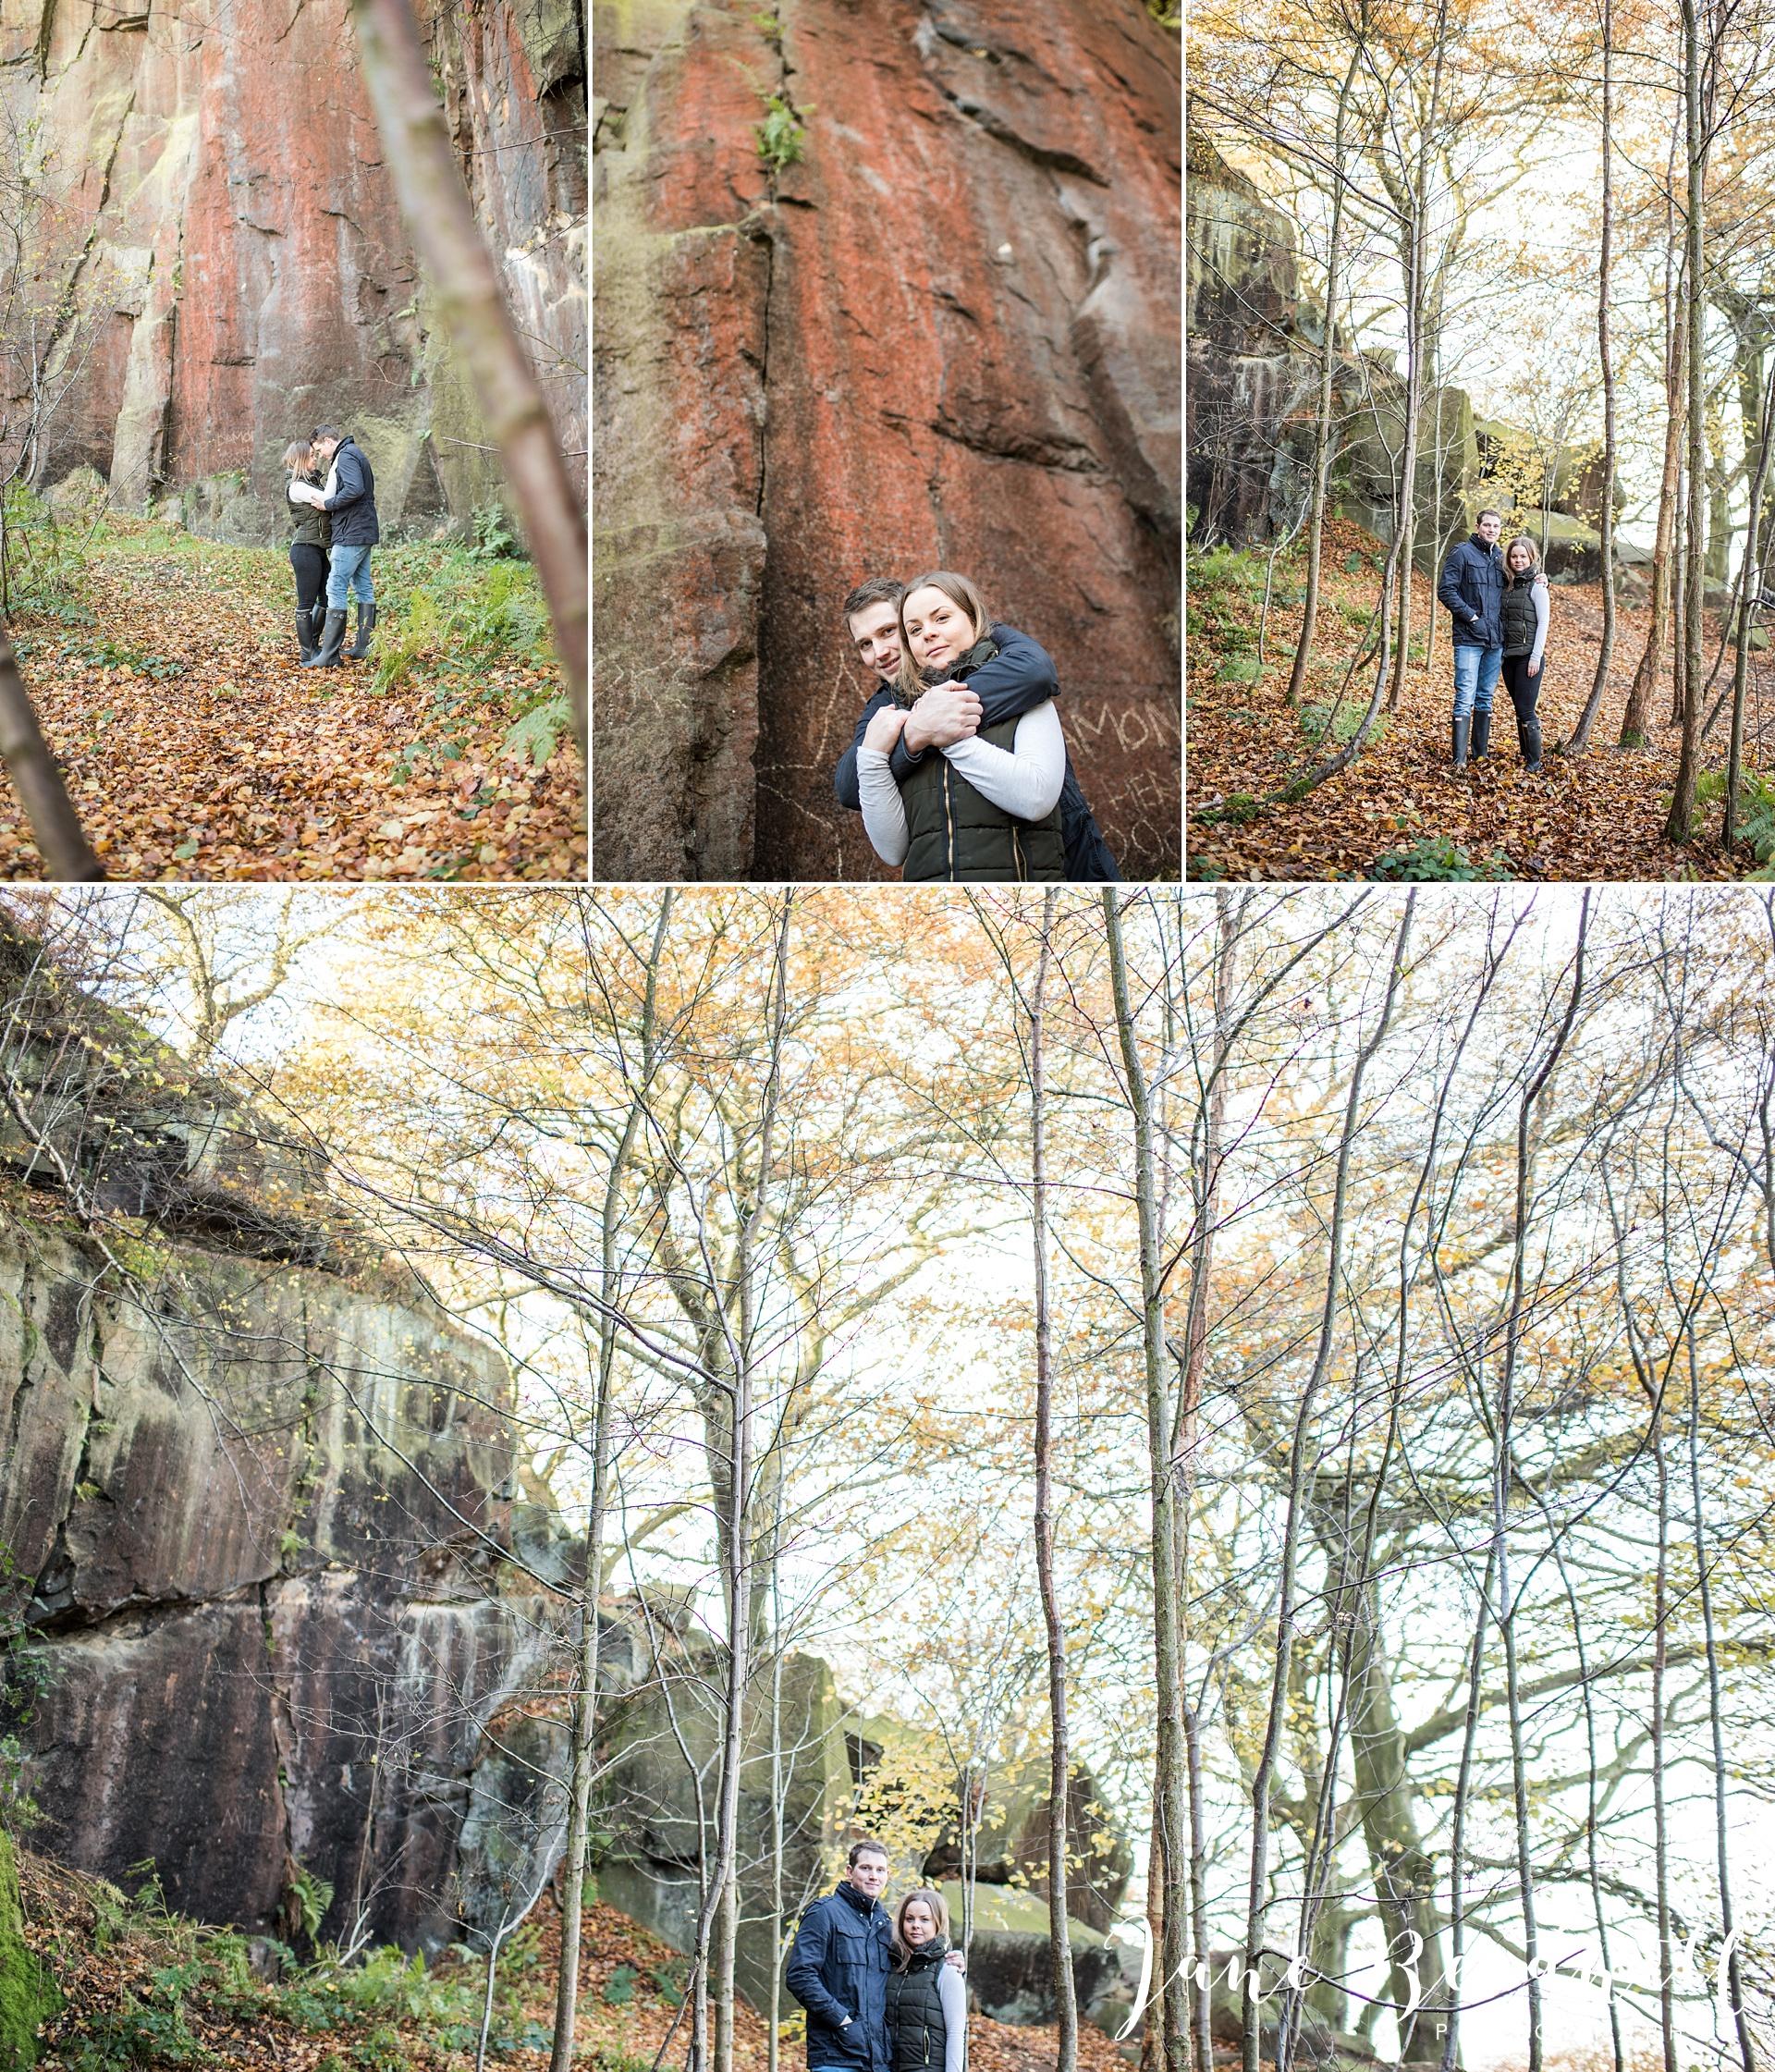 yorkshire-wedding-photographer-jane-beadnell-photography-uk-and-destination-wedding-photographer-engagement-shoot_0002